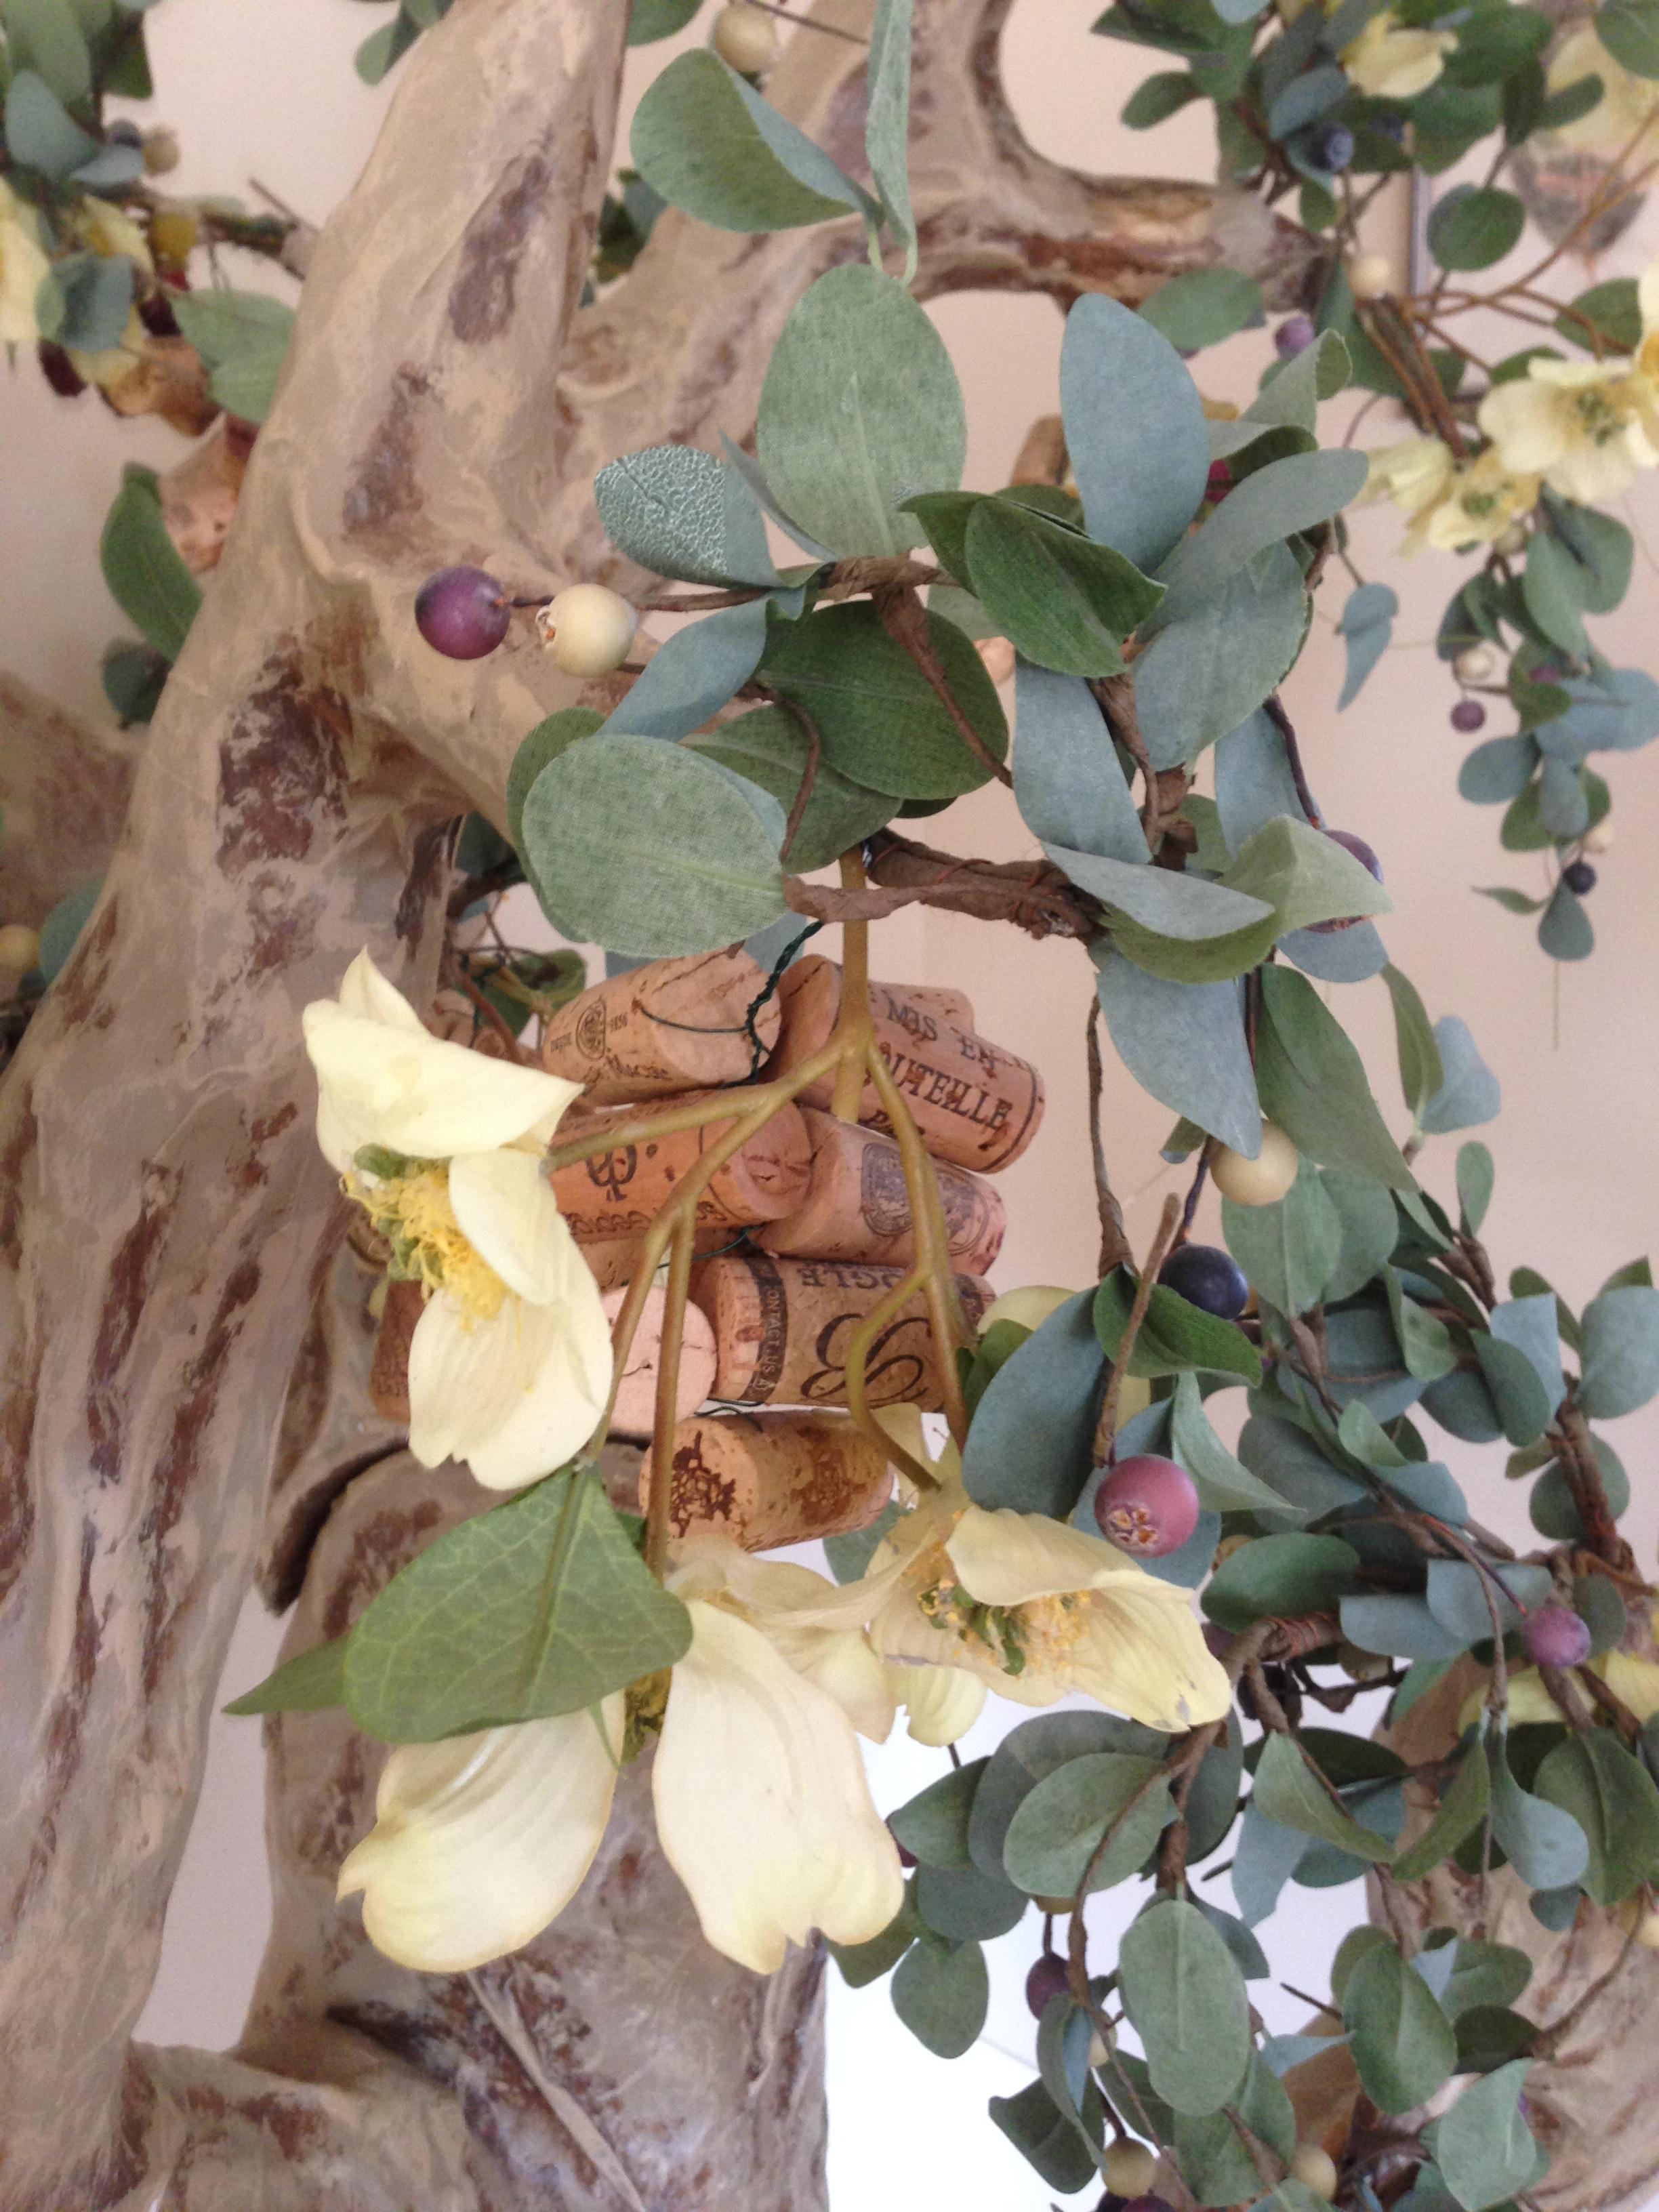 Ferdinand the Bull's cork tree (2)